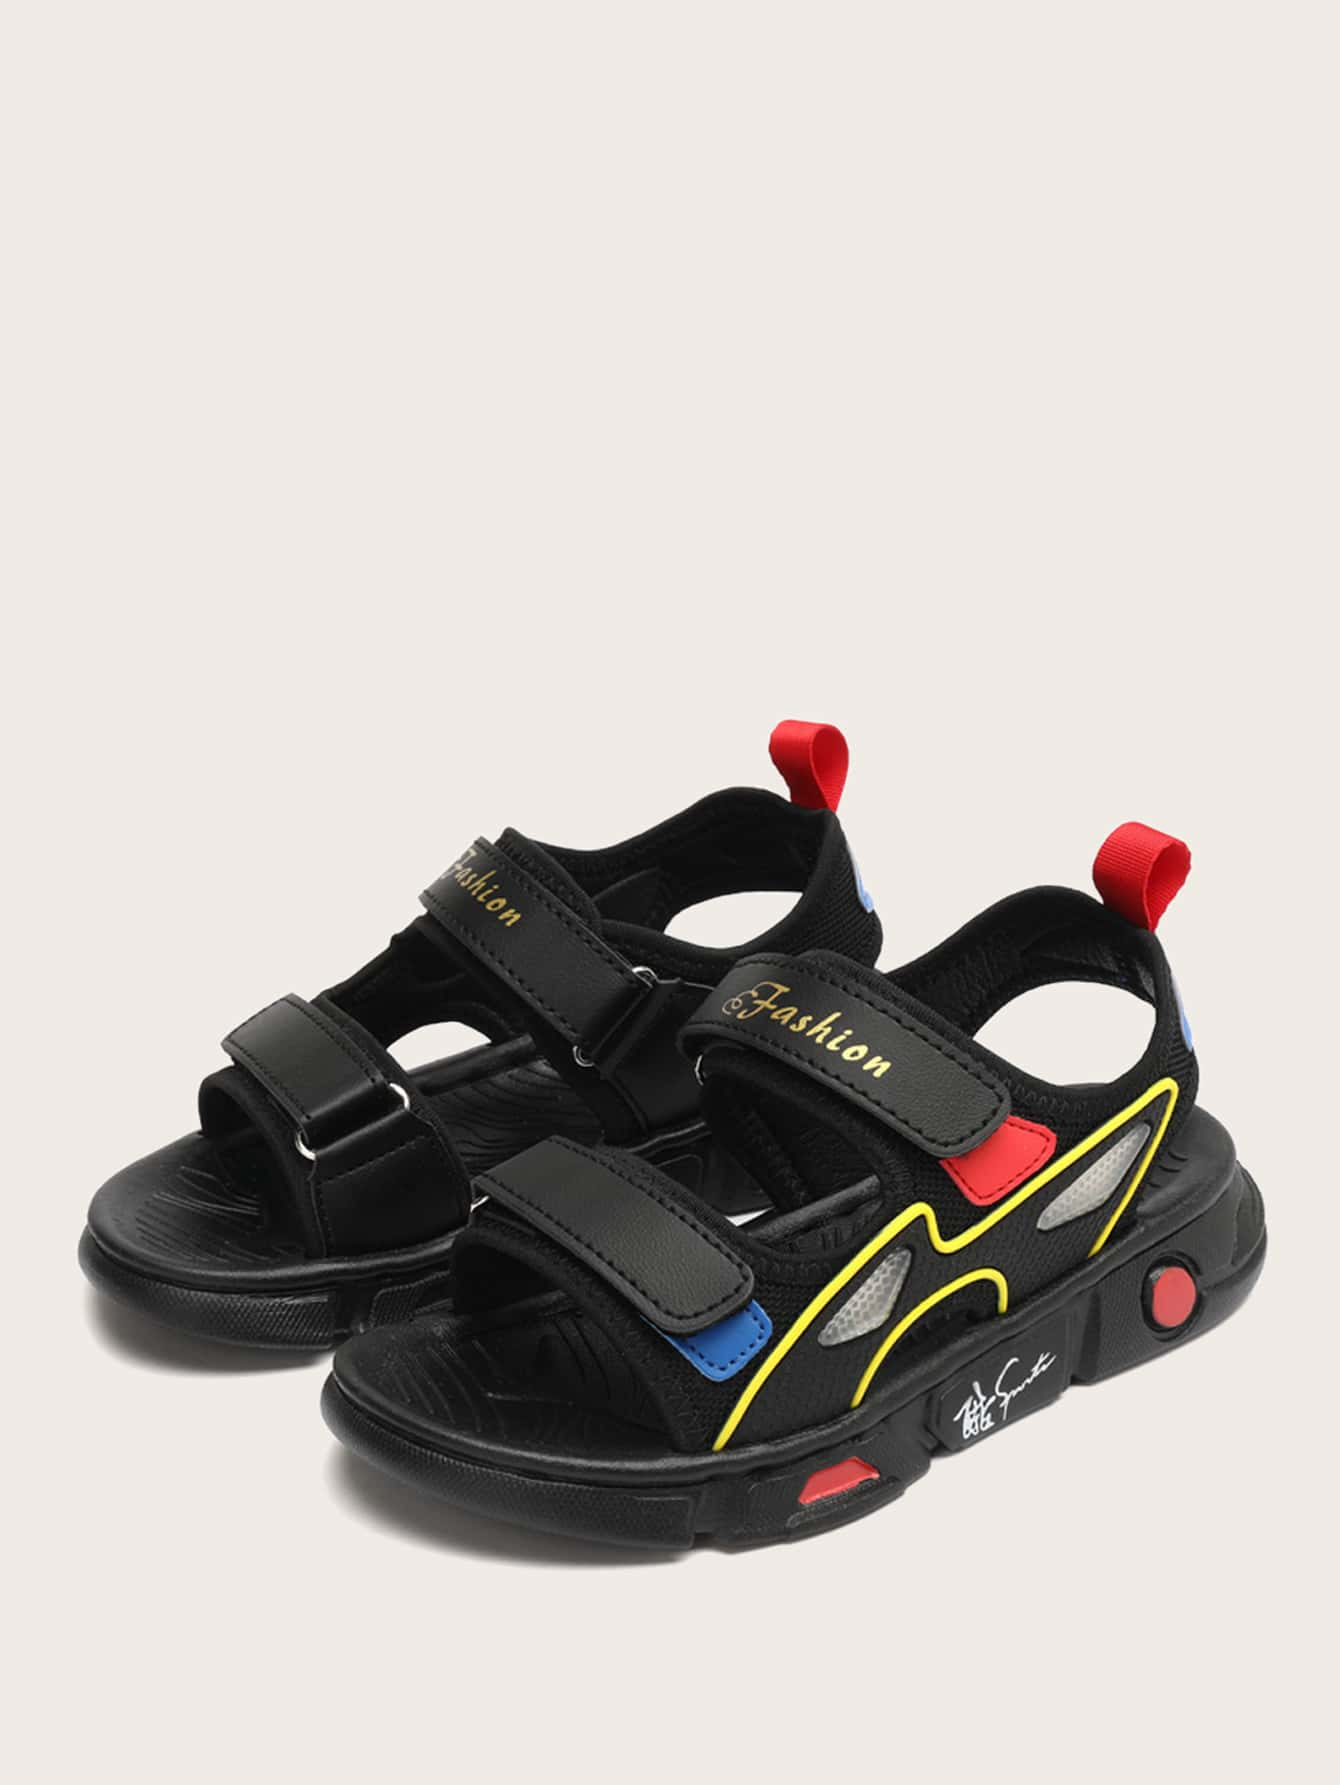 Boys Letter Graphic Velcro Strap Sandals